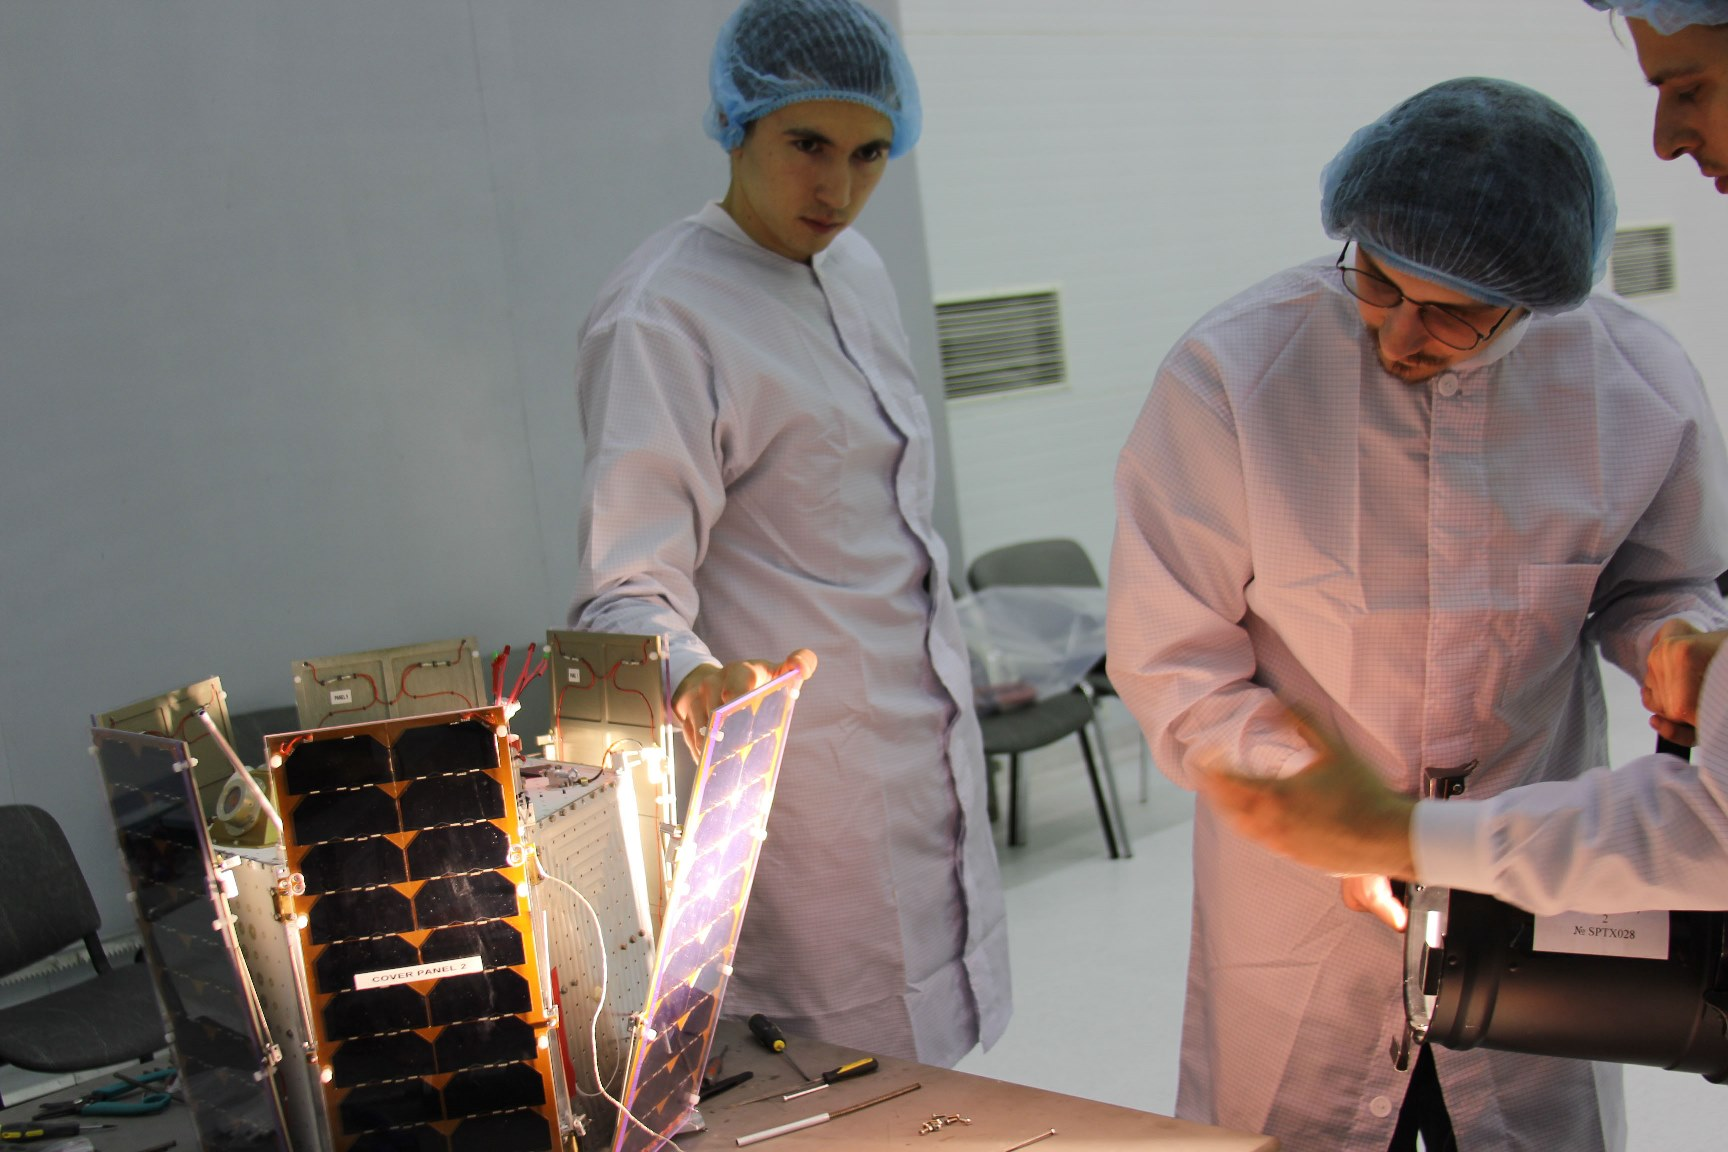 en37-pioneers-of-private-astronautics-in-russia-sputnix_04